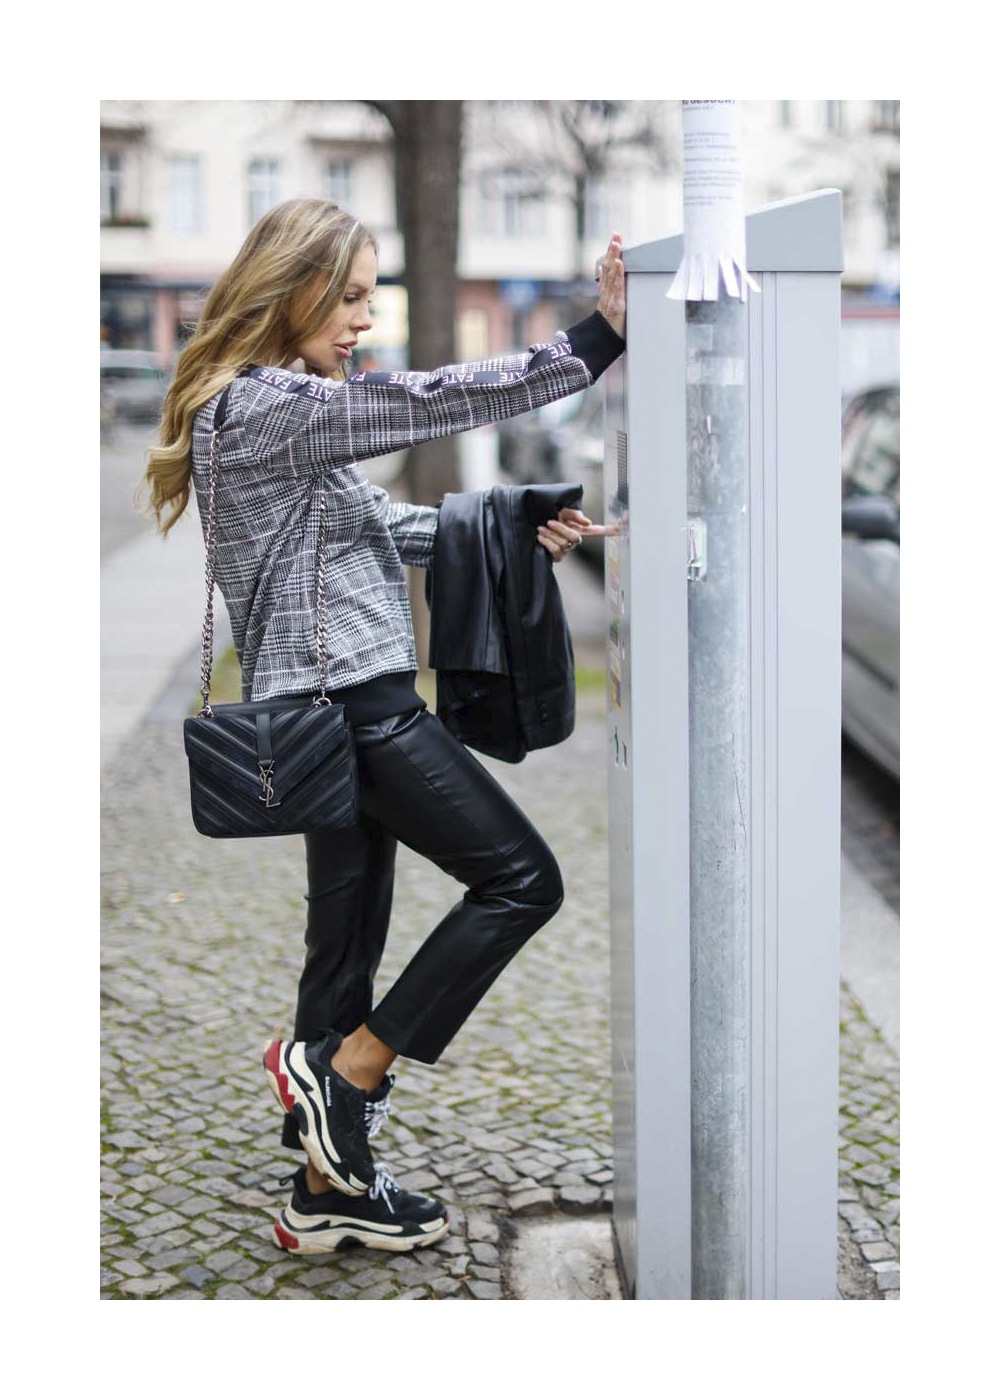 Xenia Seeberg Street Style Shooting In Berlin